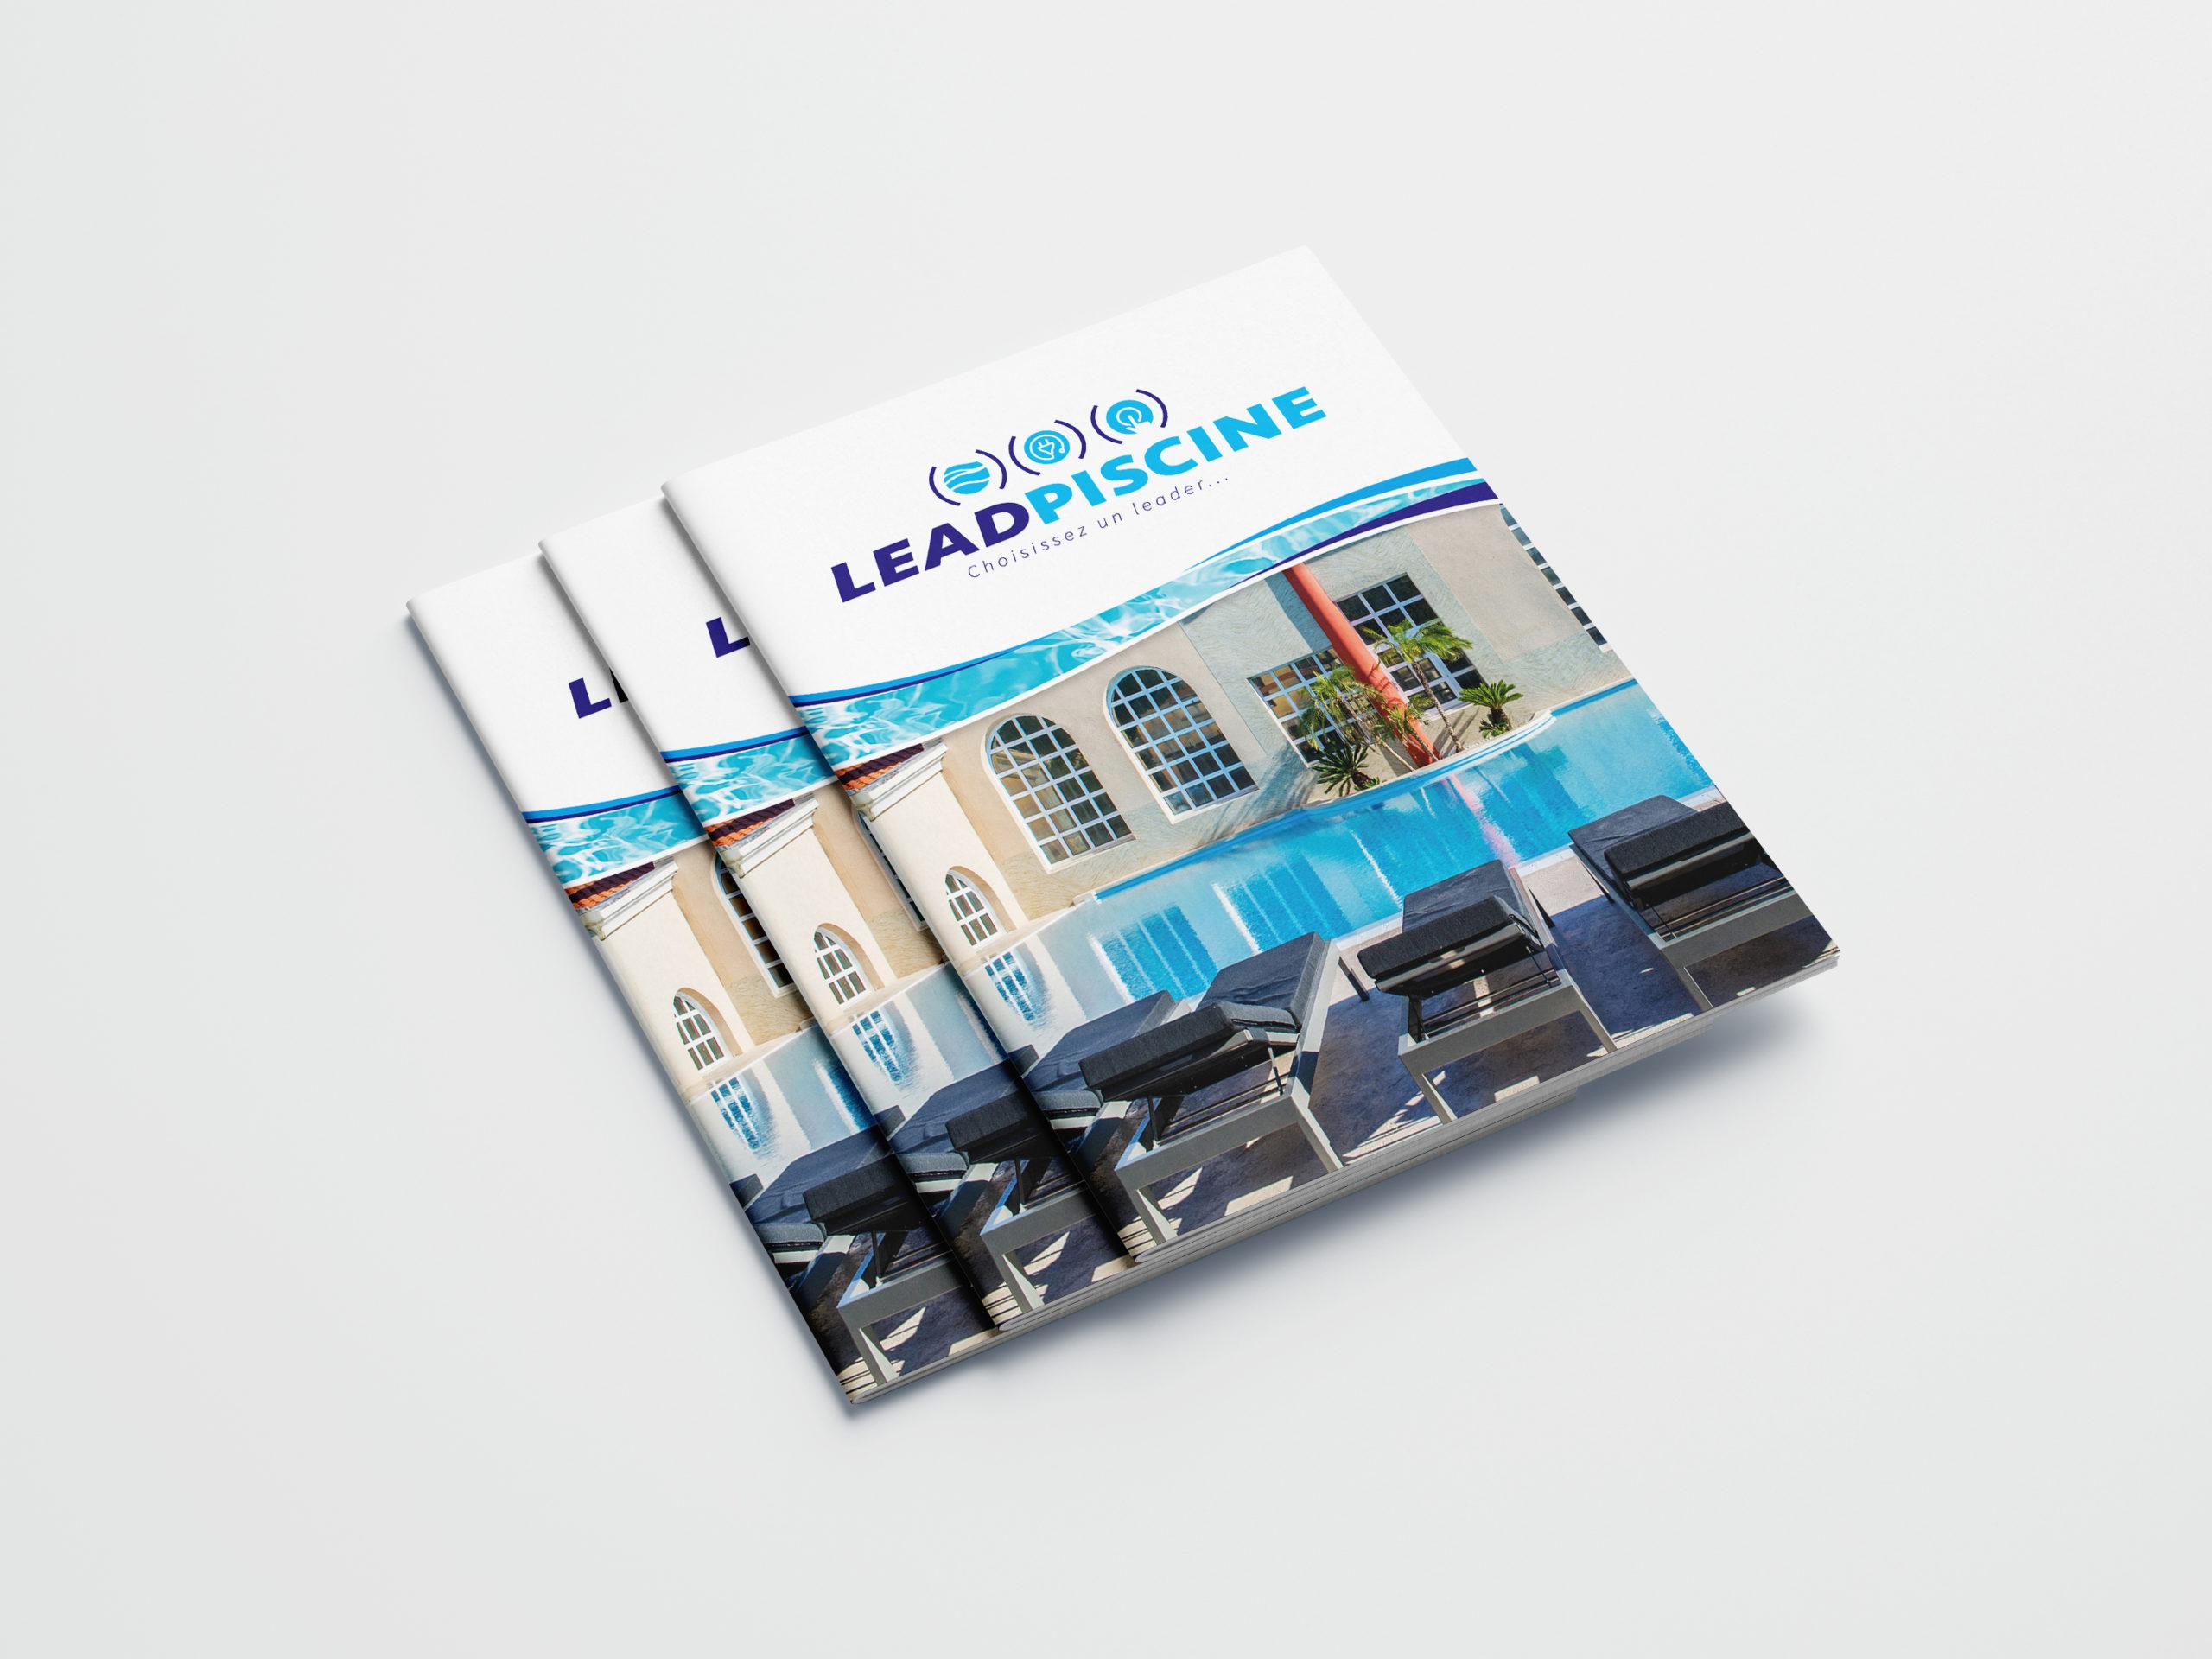 Lead Piscine